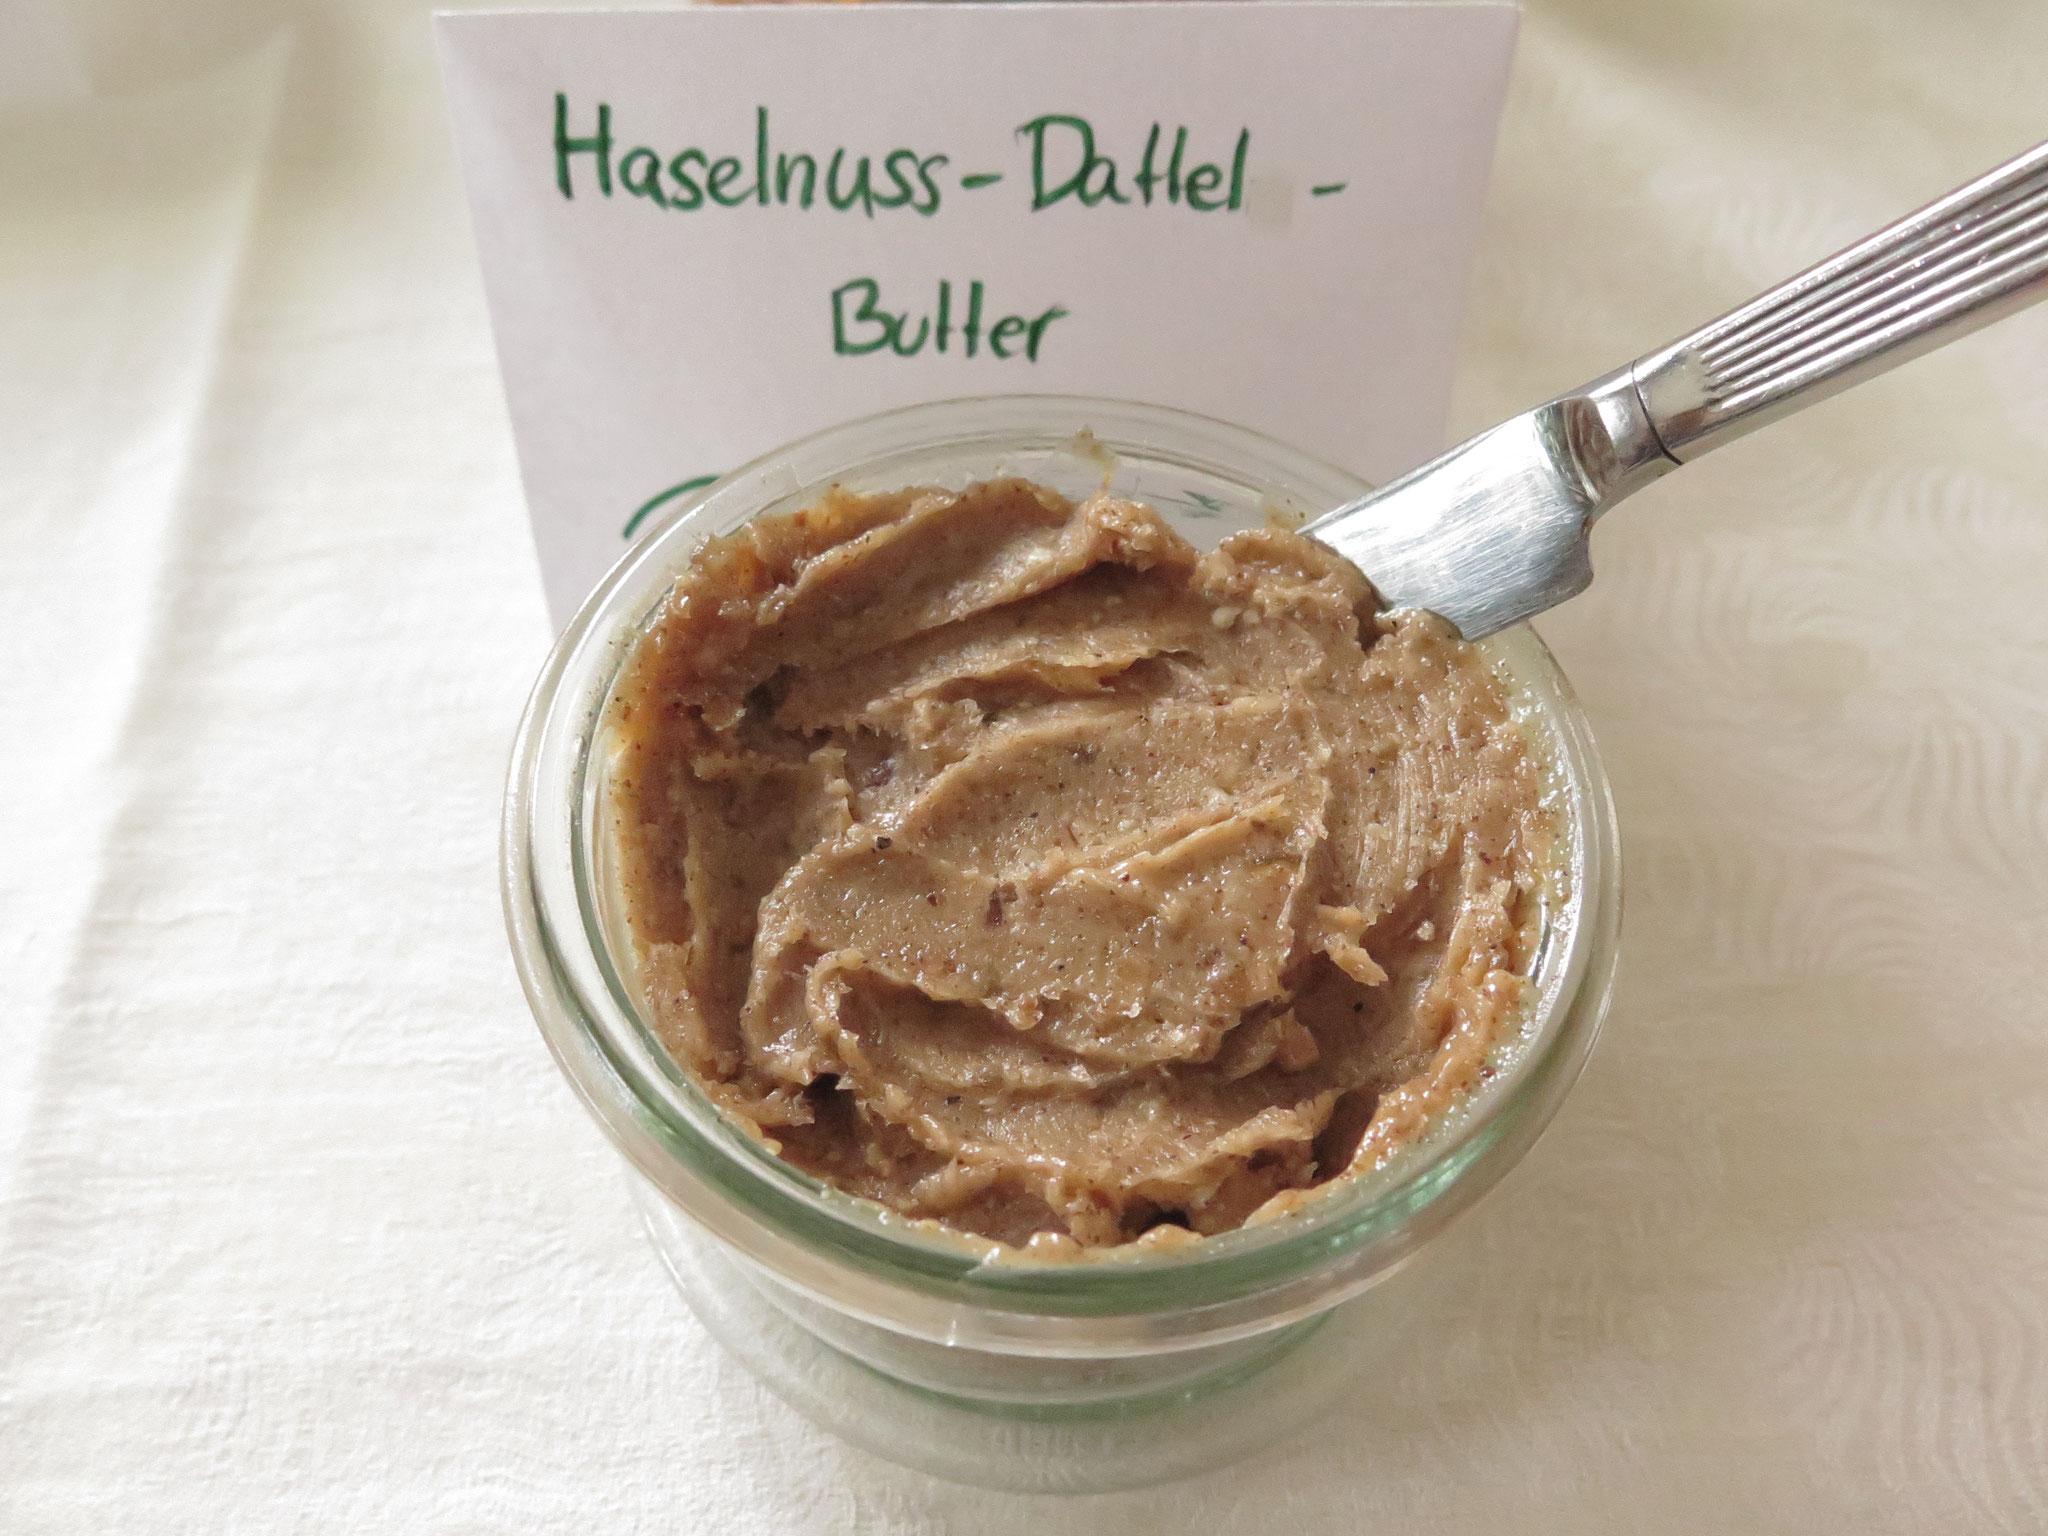 Haselnuss-Dattel-Butter